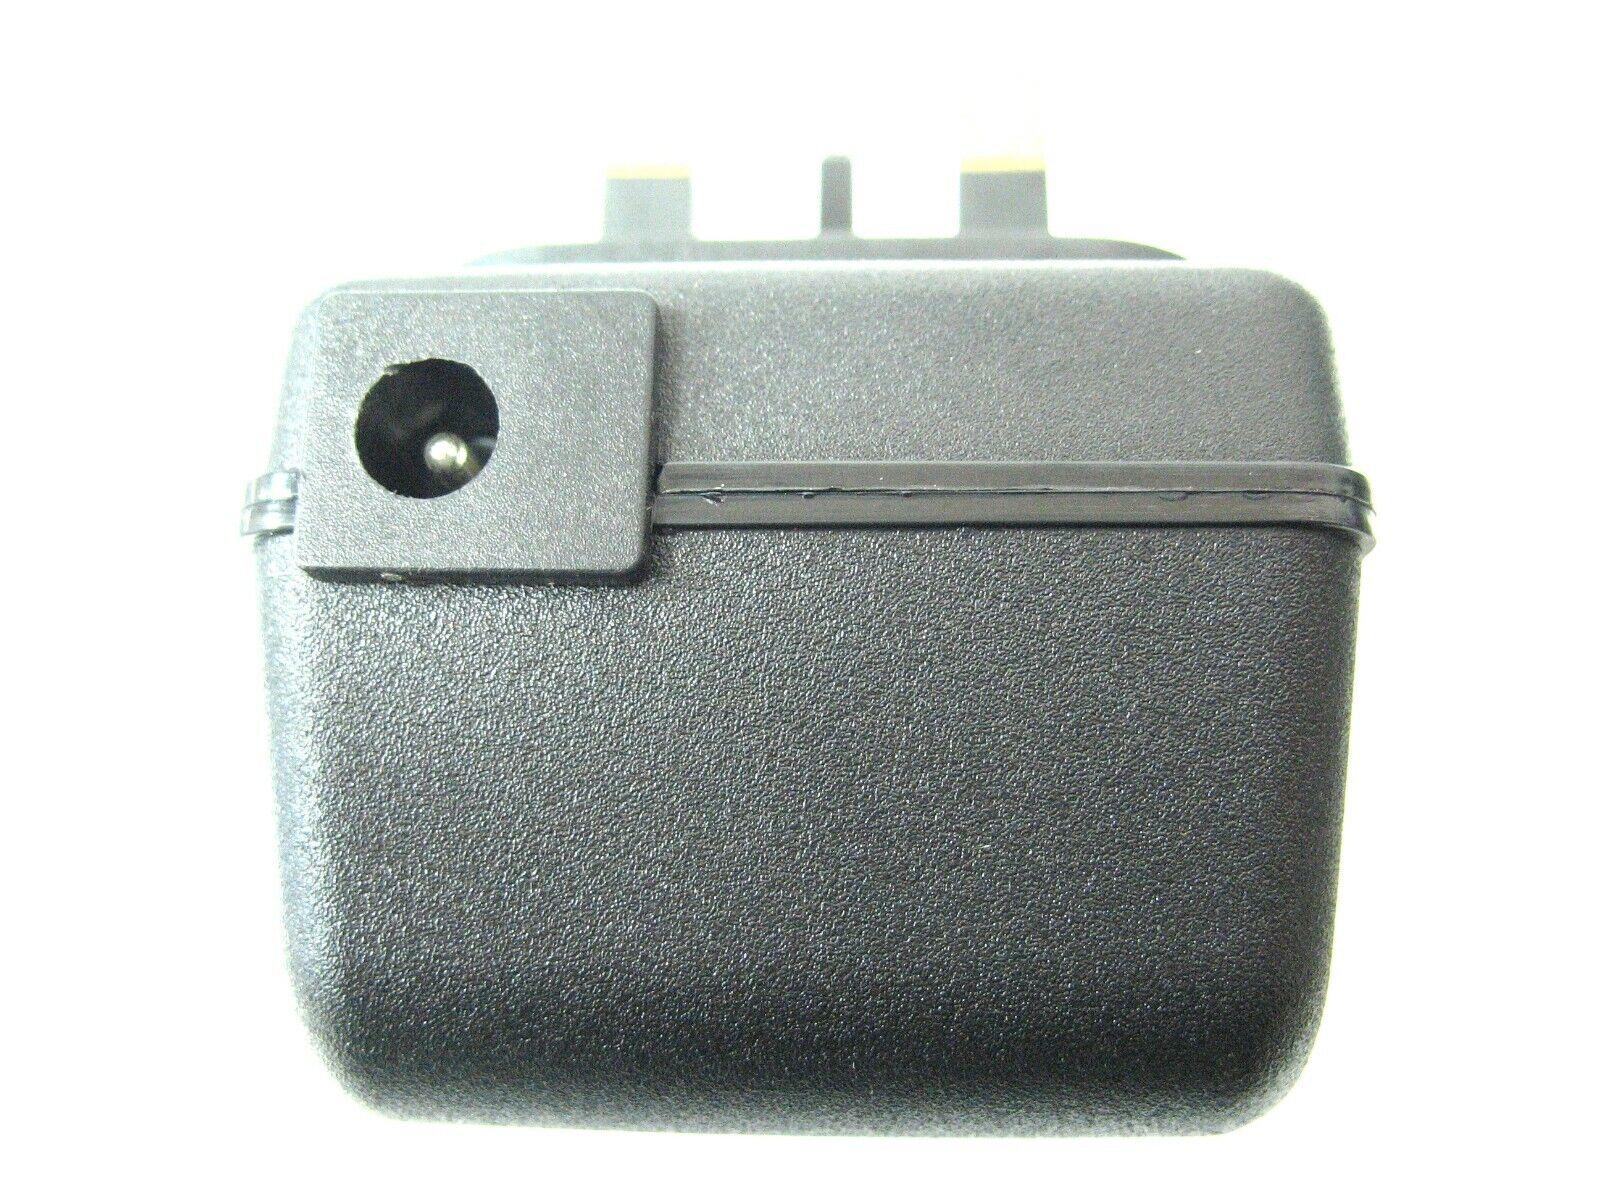 0.2 amp 24 volt Socket AC-AC (AC Output) Power Adaptor/Supply/Charger (4.8 watt)